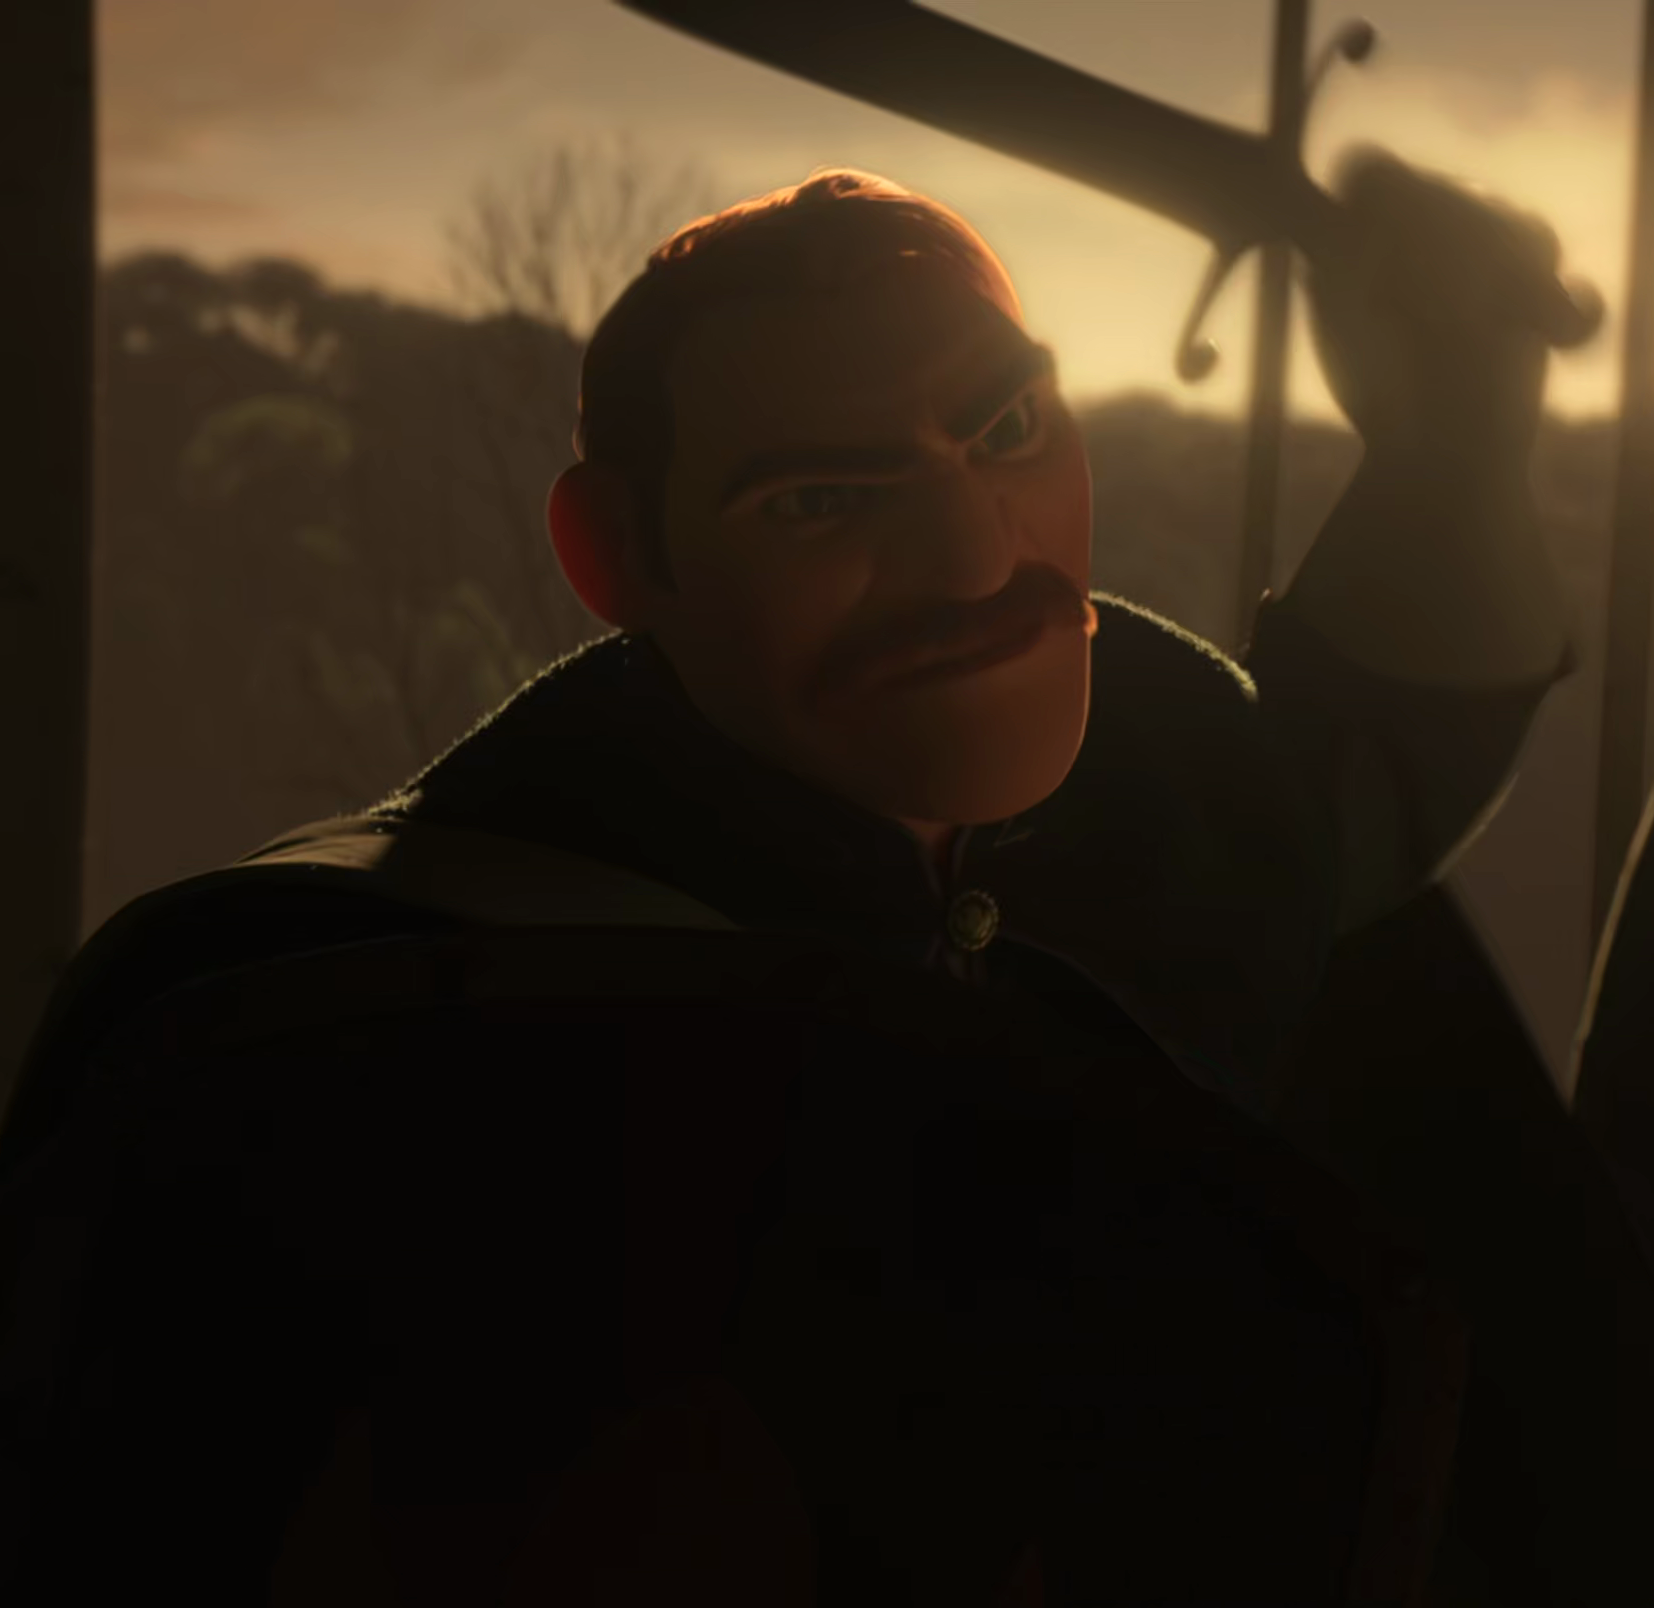 Misry6/Pure Evil Removal Proposal: Frozen II's Villain